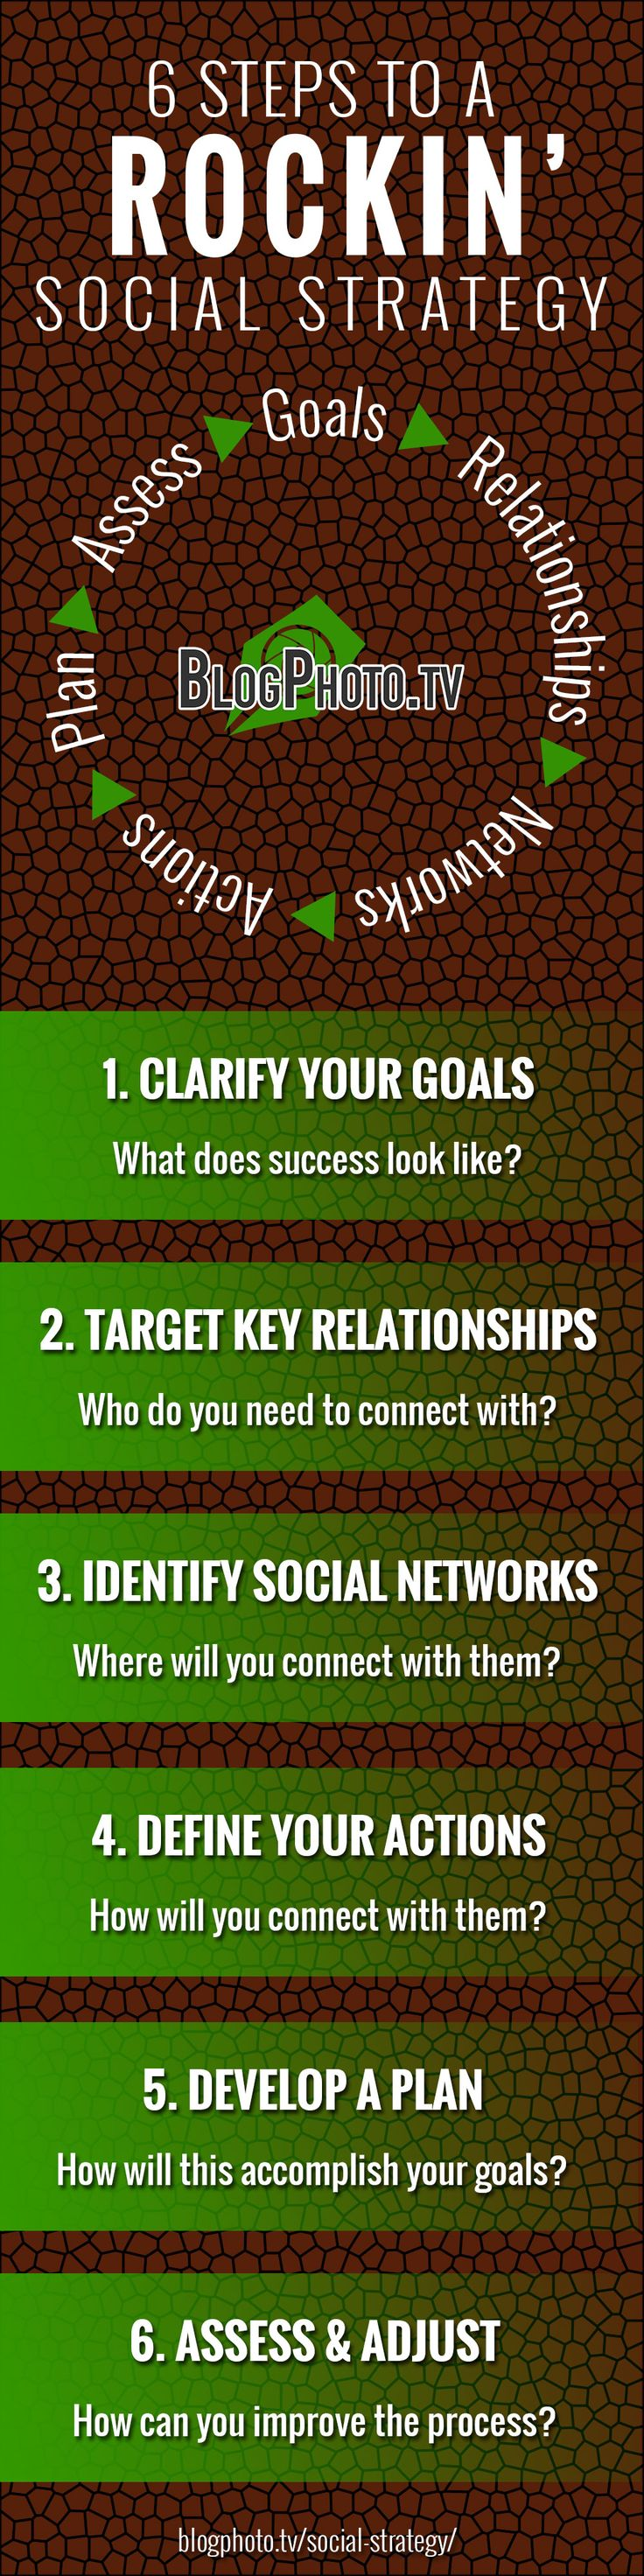 18 best Enterprise Organizational Culture images on Pinterest